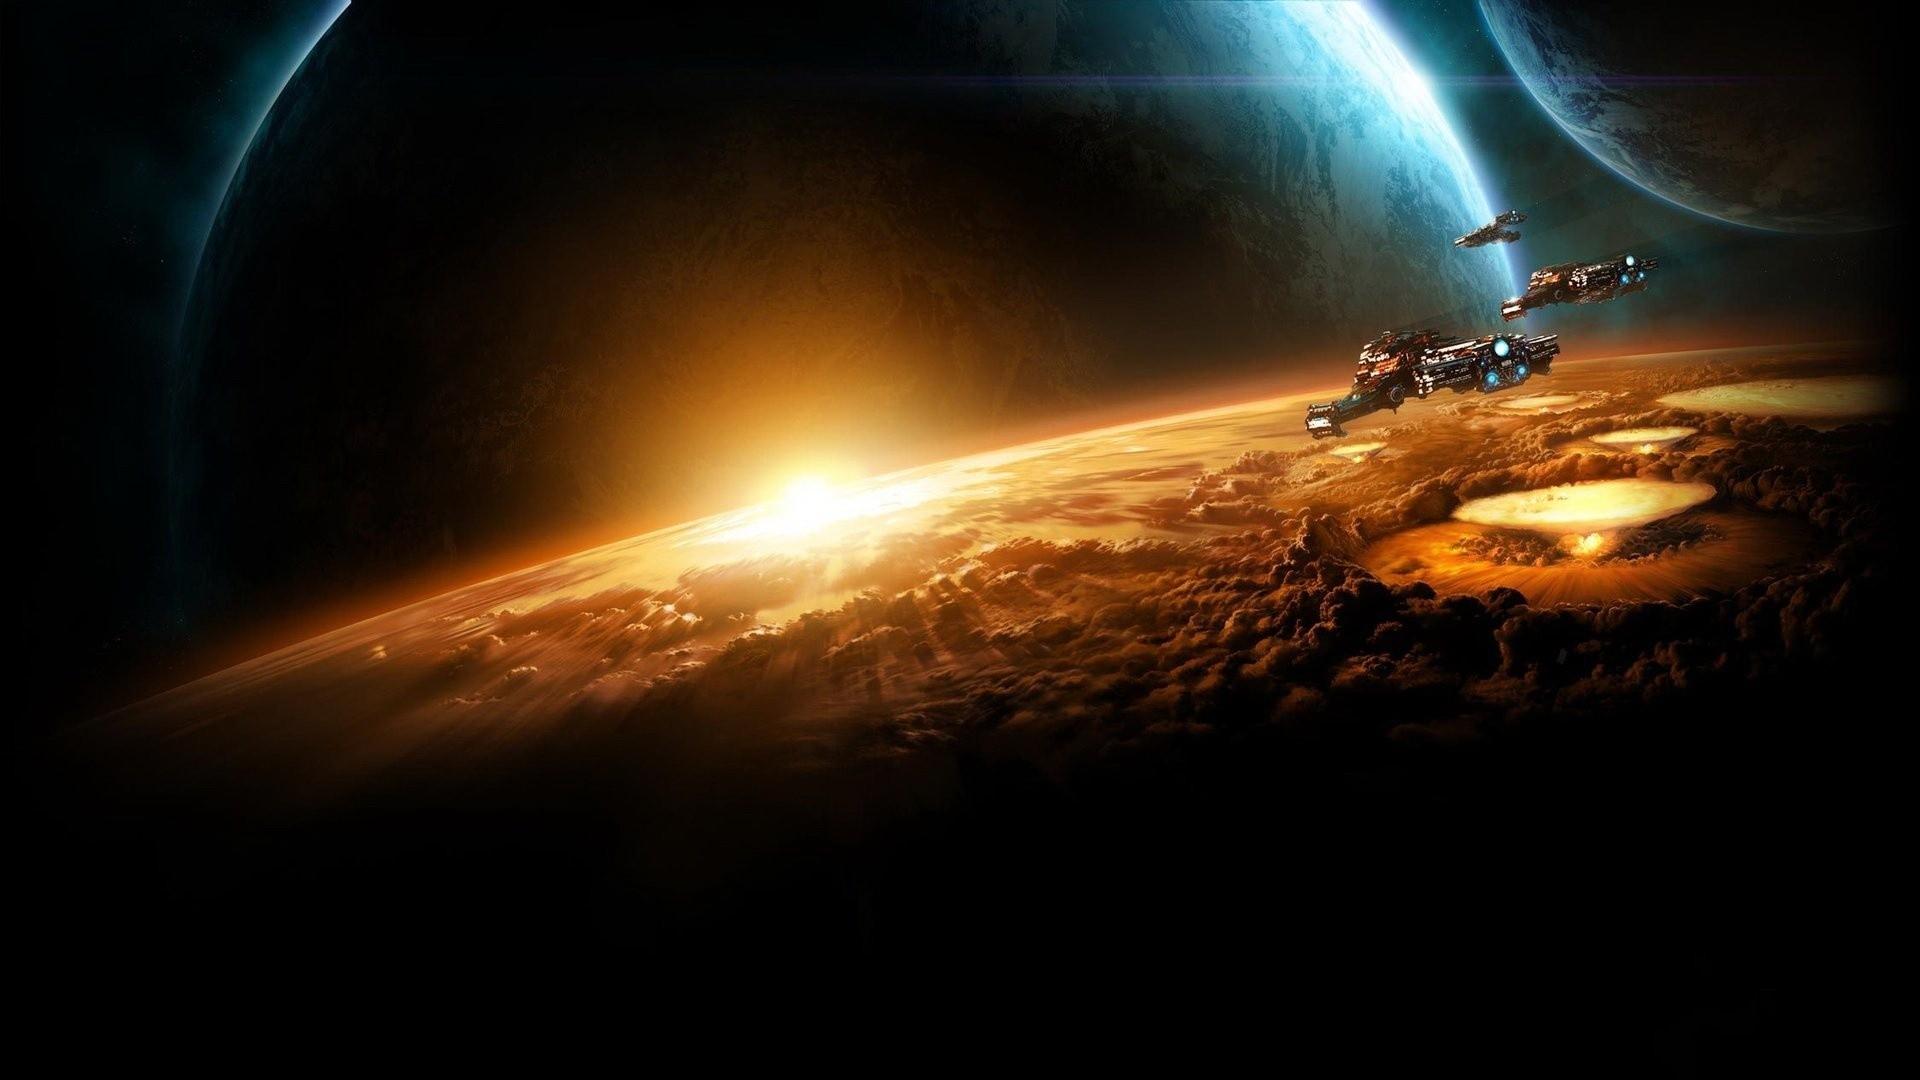 Wallpaper starcraft, planet, sun, earth, space